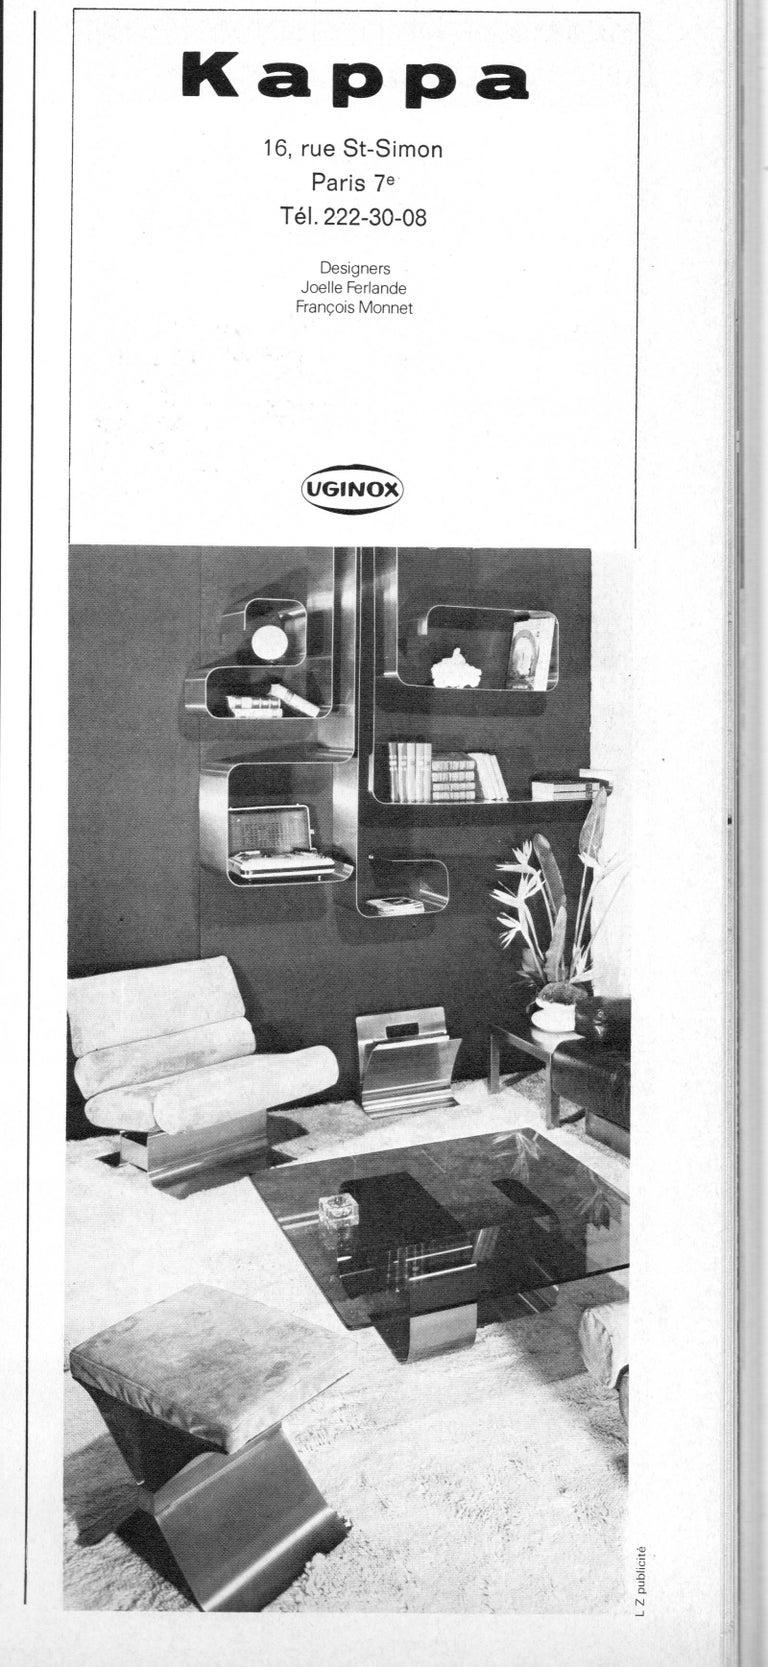 Zig-Zag Shelves by Joelle Ferlande & François Monnet for Kappa, 1970, Set of Two For Sale 2